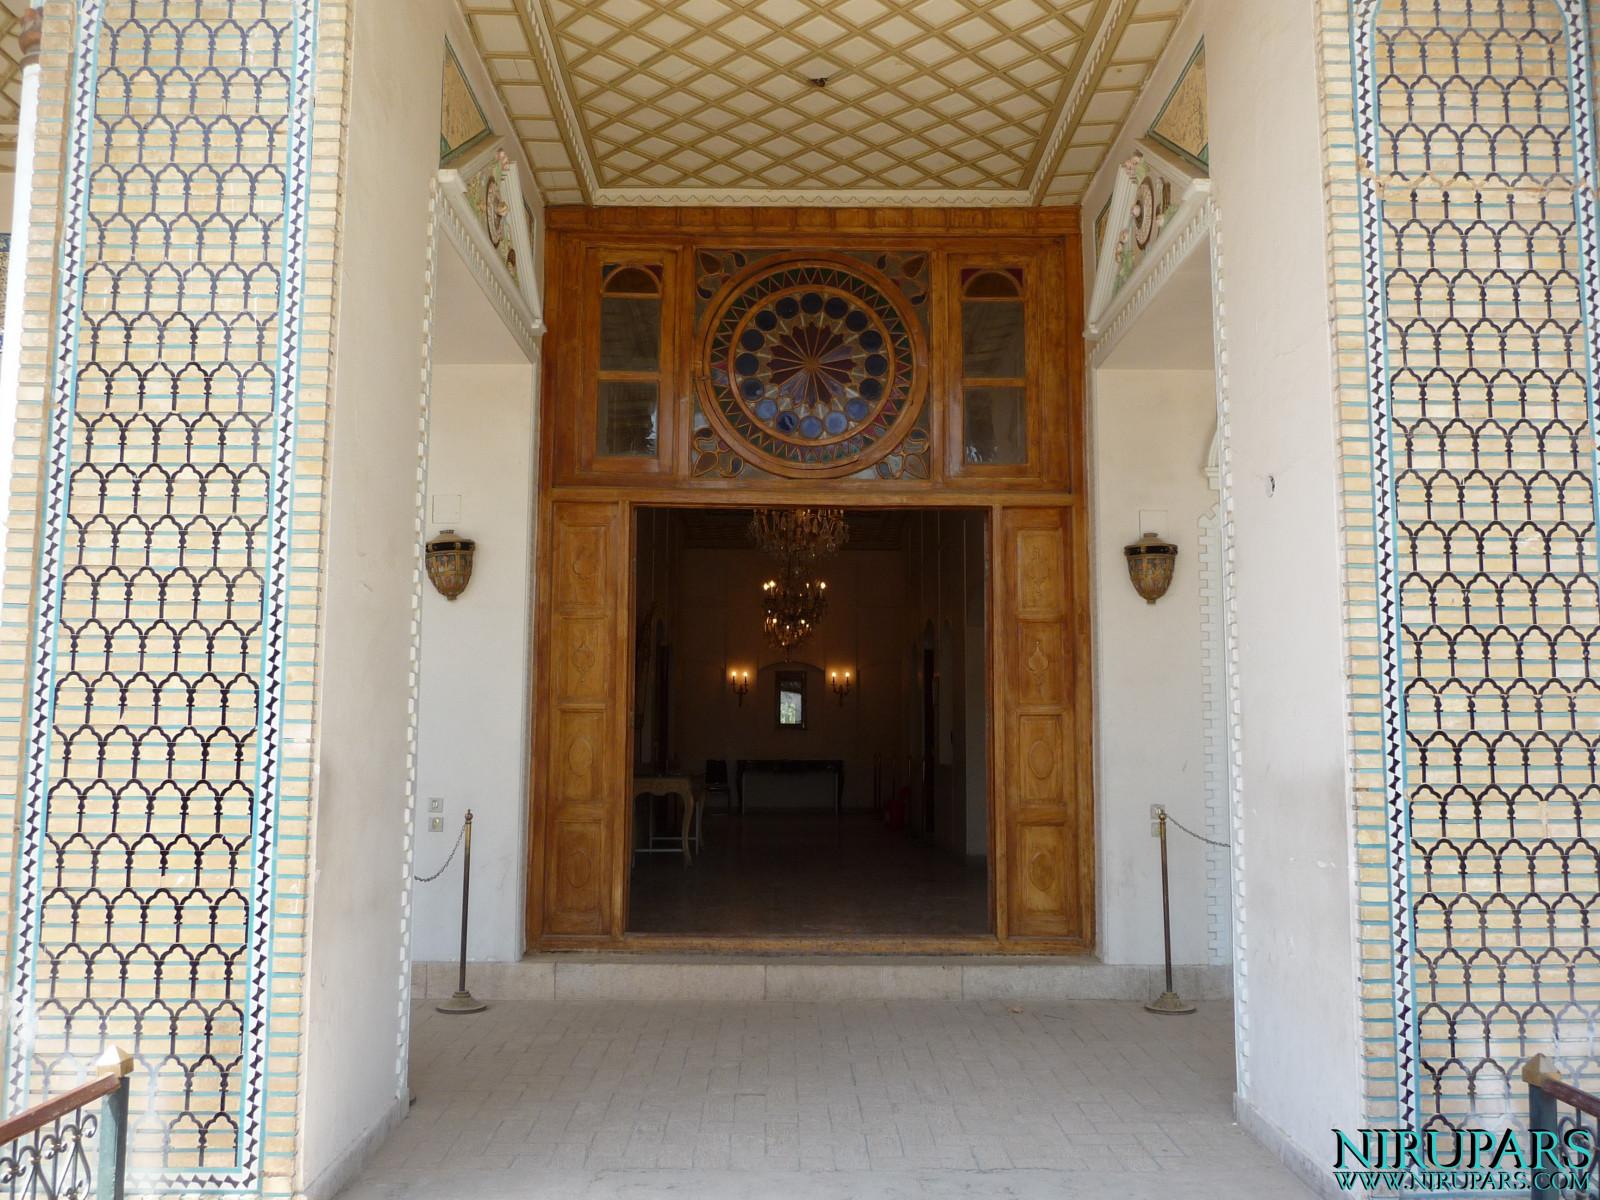 Baq-e Afifabad - Entrance Museum